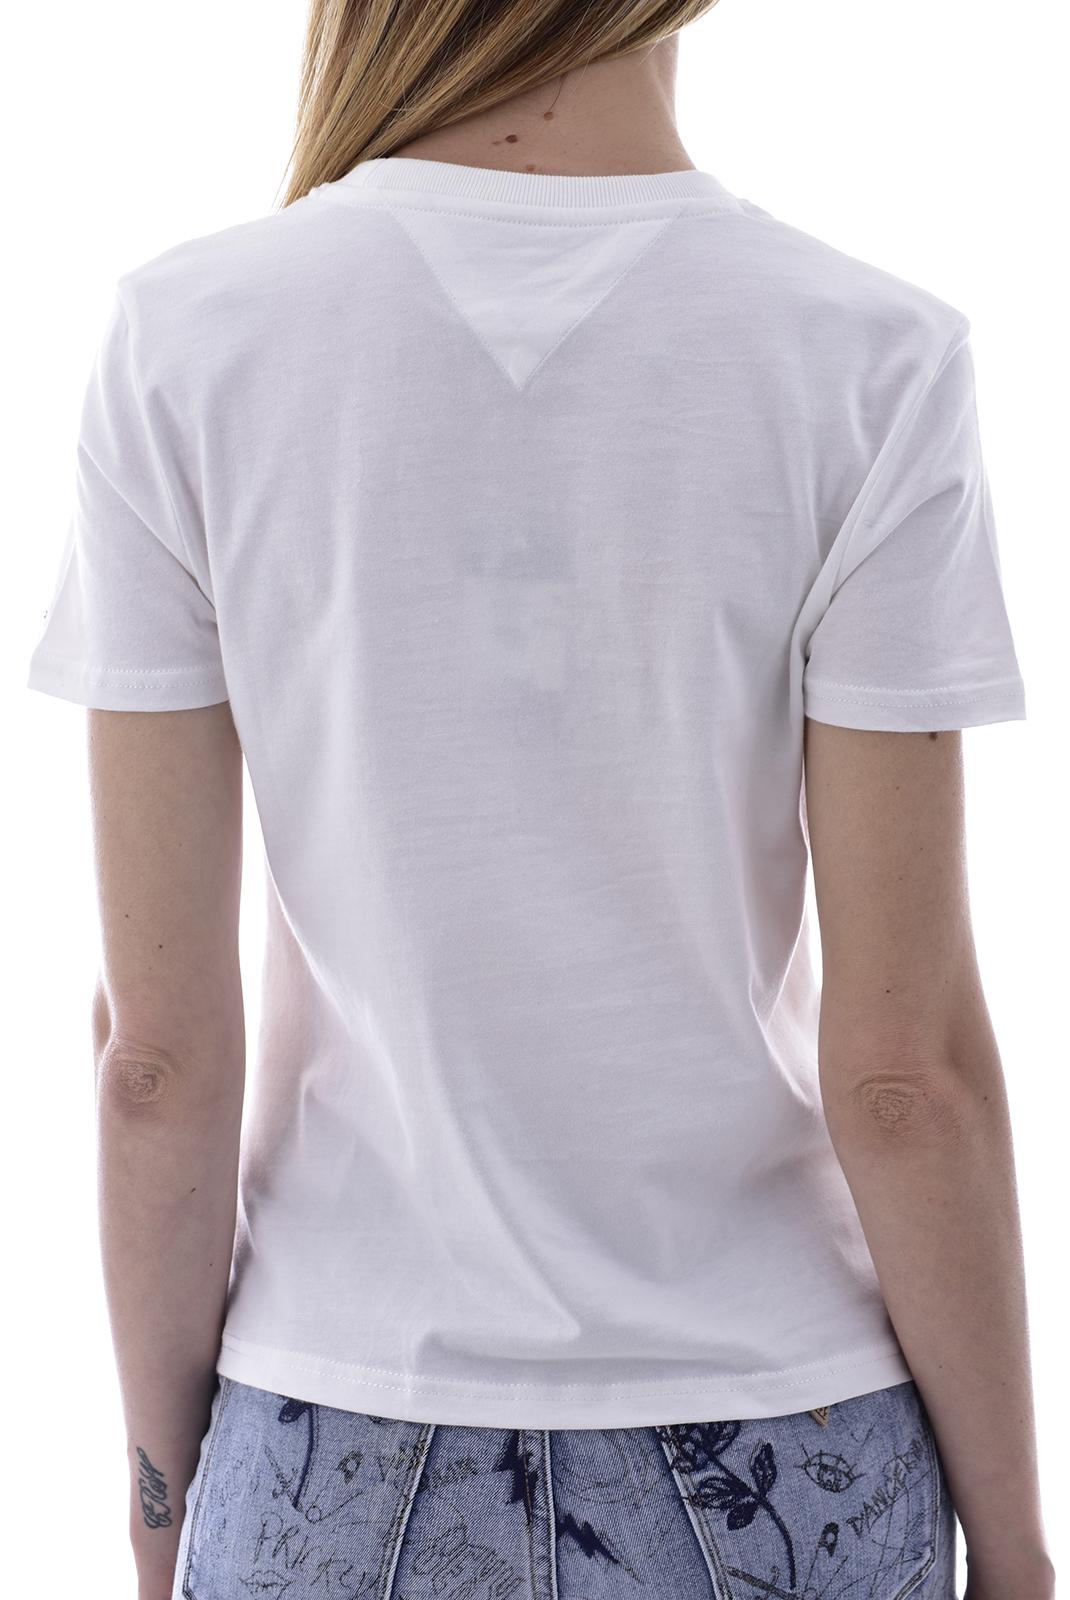 Tee shirt  Tommy Jeans DW0DW08052 NYC YBR WHITE